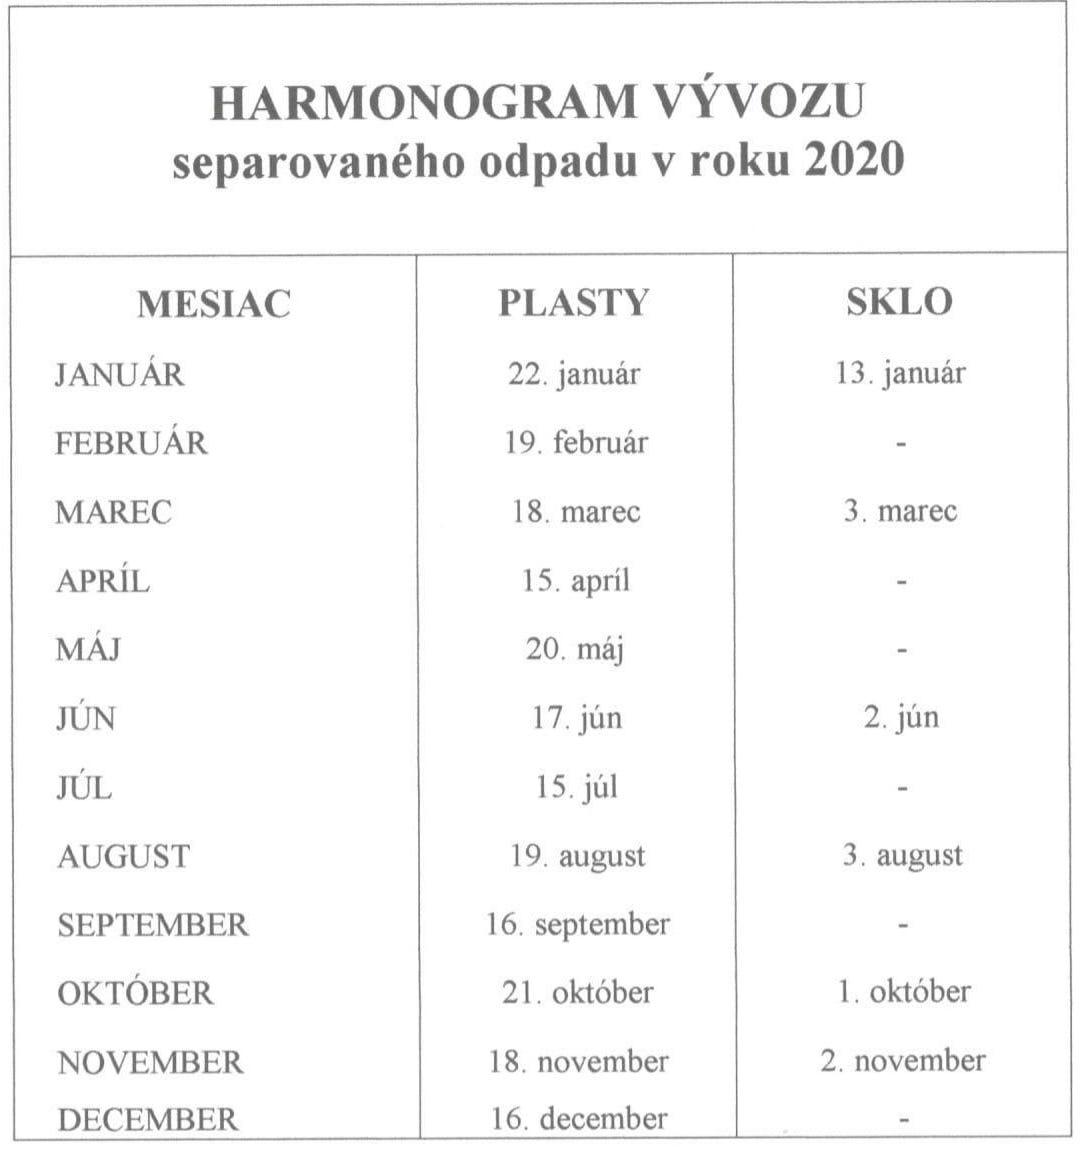 Harmonogram_vyvozu_2020